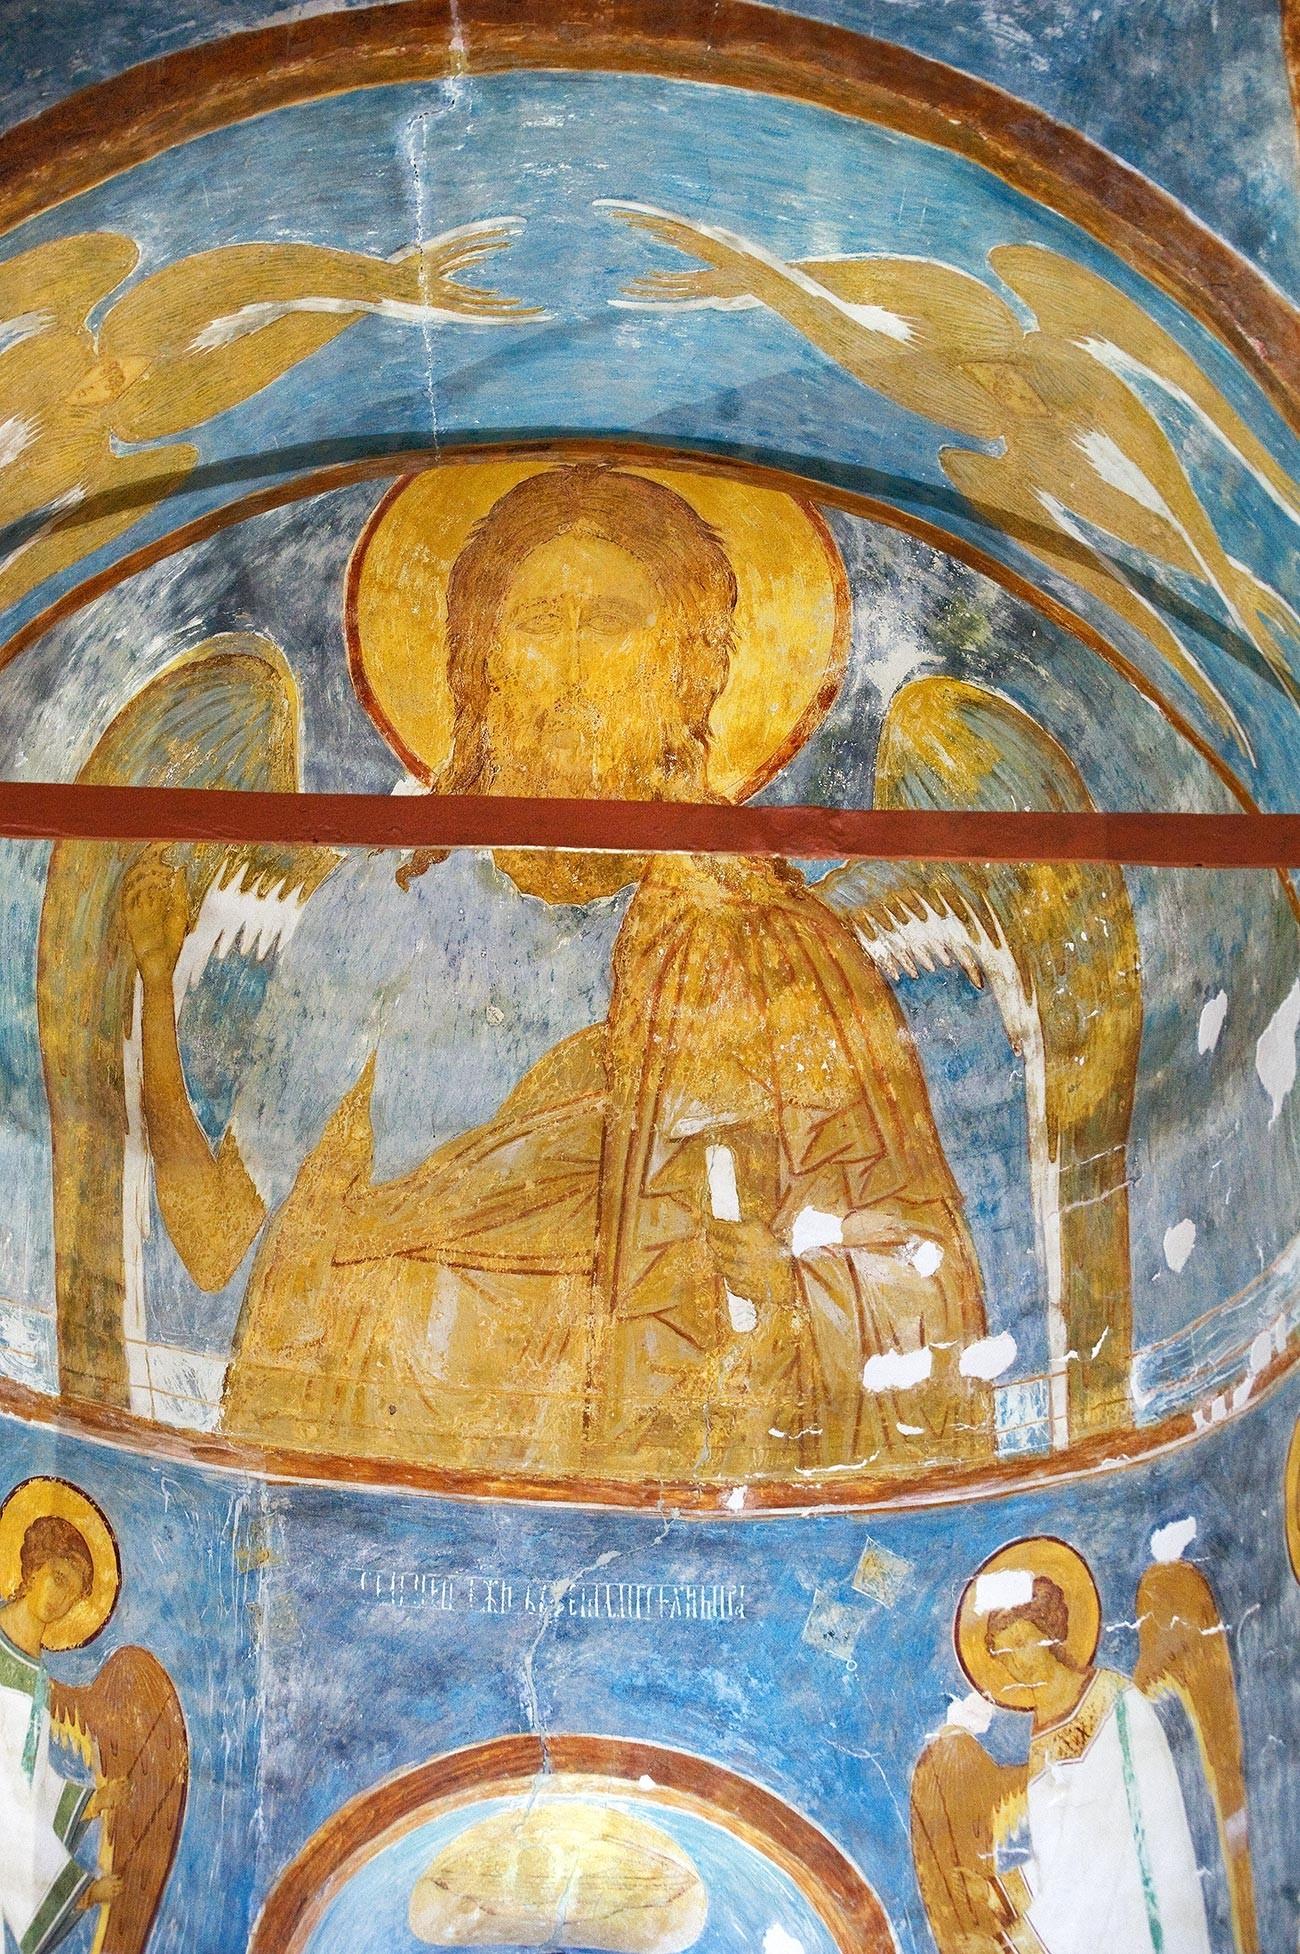 Katedrala rojstva Device Marije. Severna apsida s fresko Janeza Krstnika, angela v puščavi. 1. junij 2014